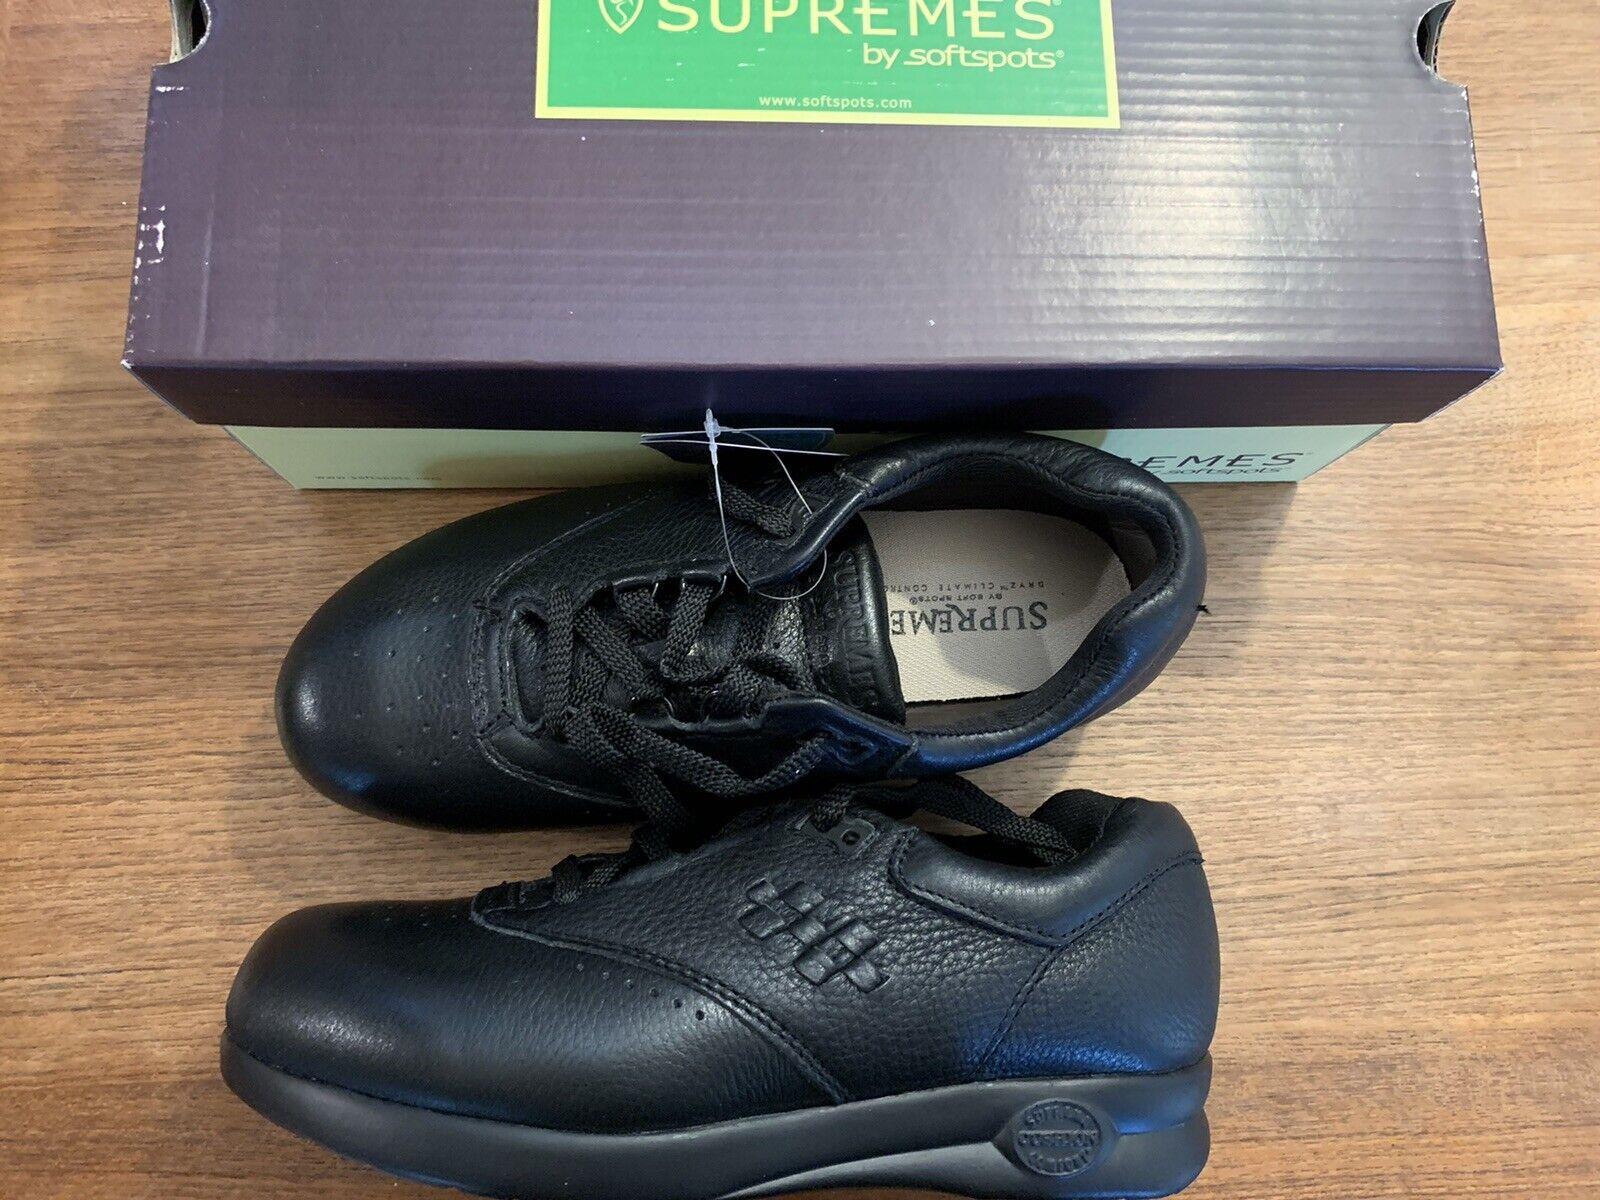 Supremes by Softspots Women's Marathon 122401 Black Anti-Slip US-7 EUR-38 NEW!